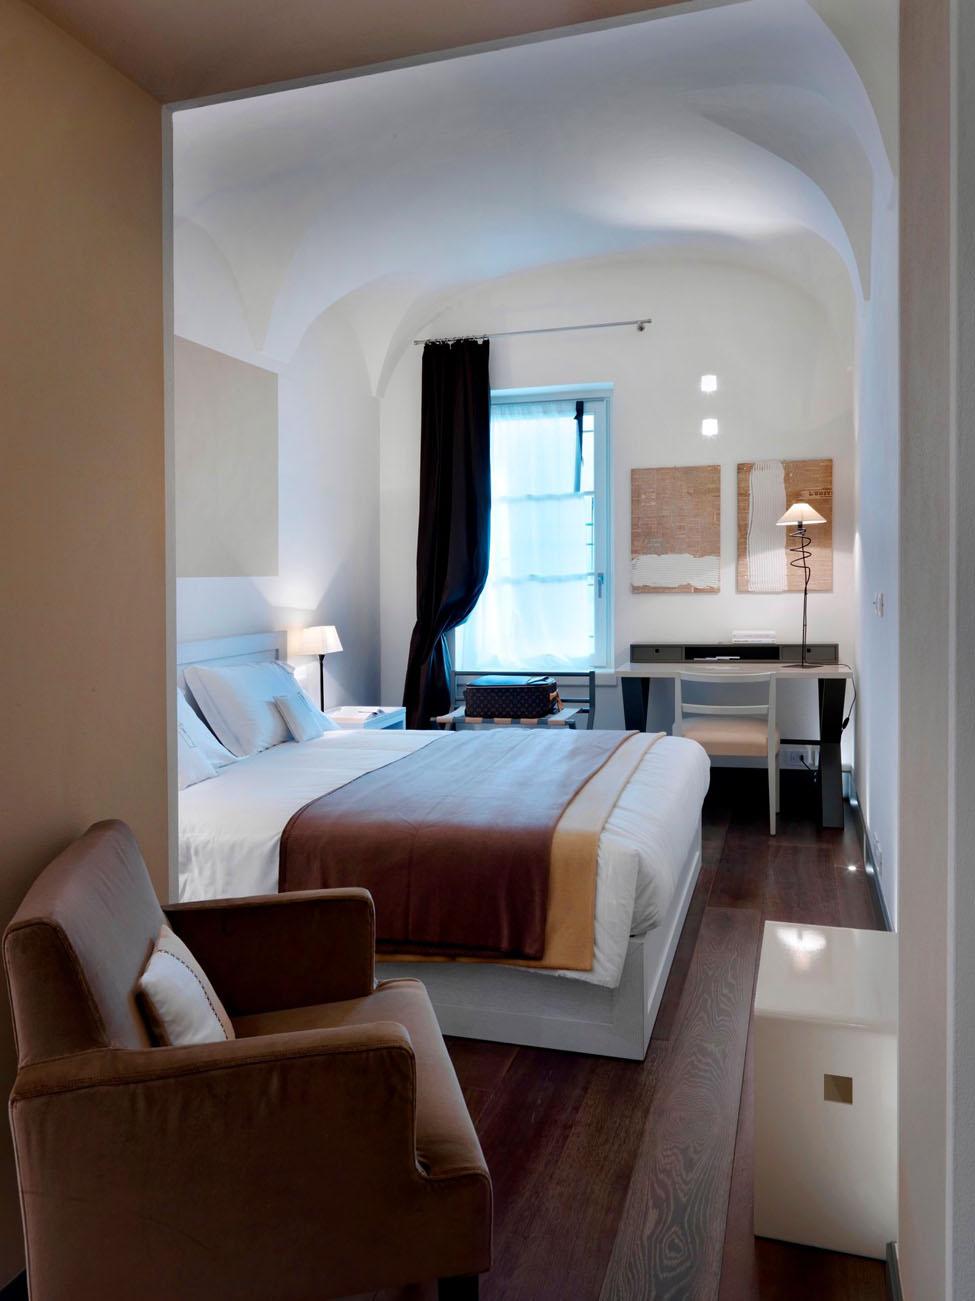 Gombithotel contemporary design in medieval city idesignarch interior design architecture - Interior design bergamo ...